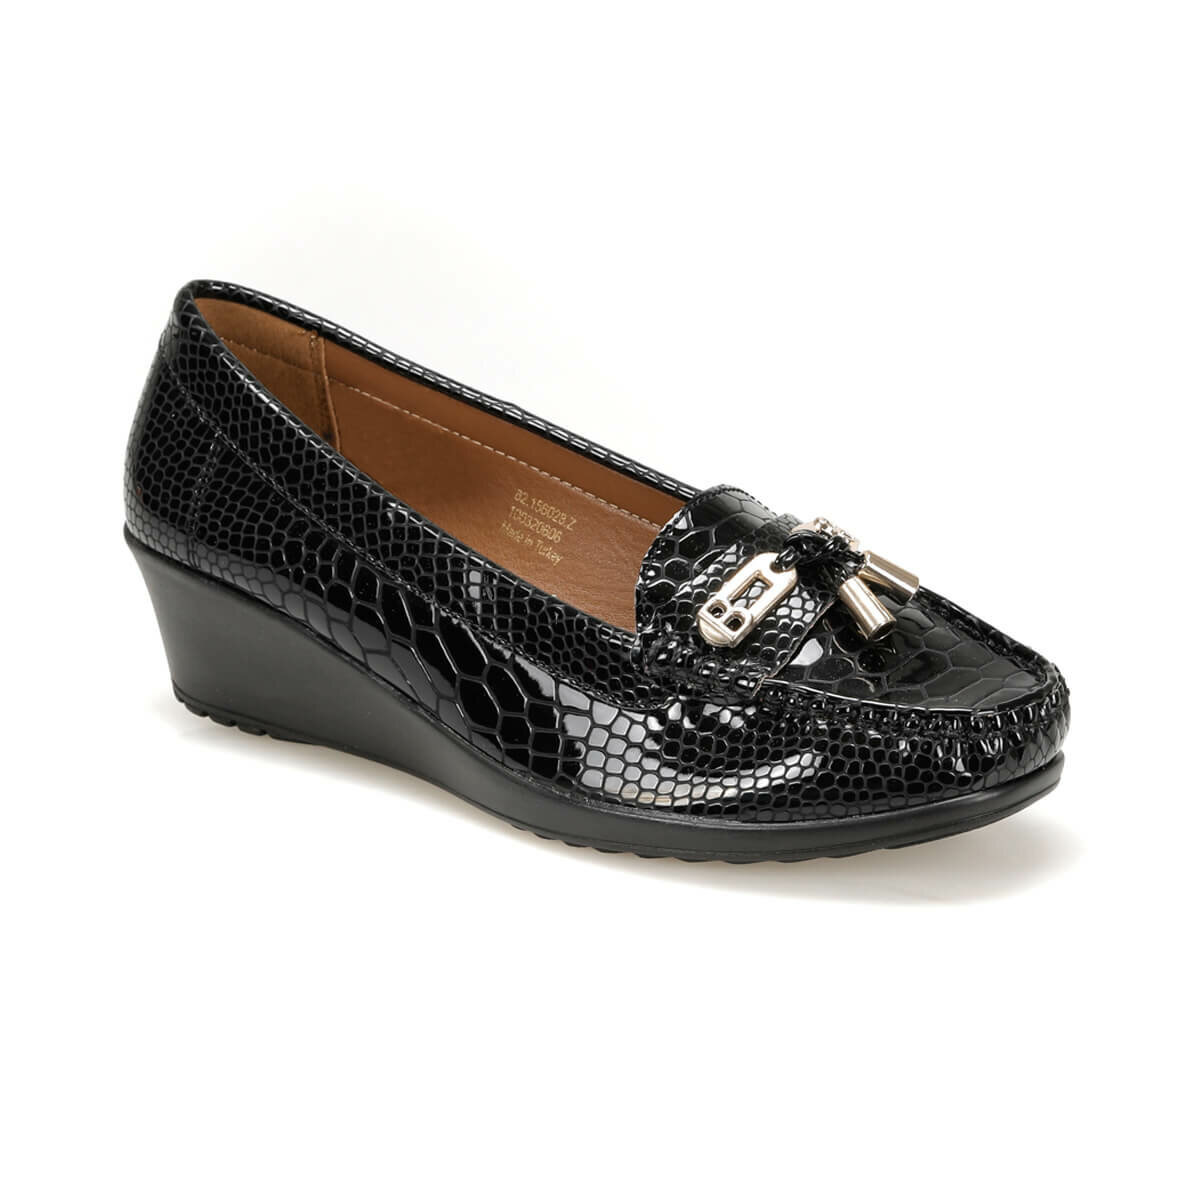 FLO 82.156028.Z Black Women Shoes Polaris